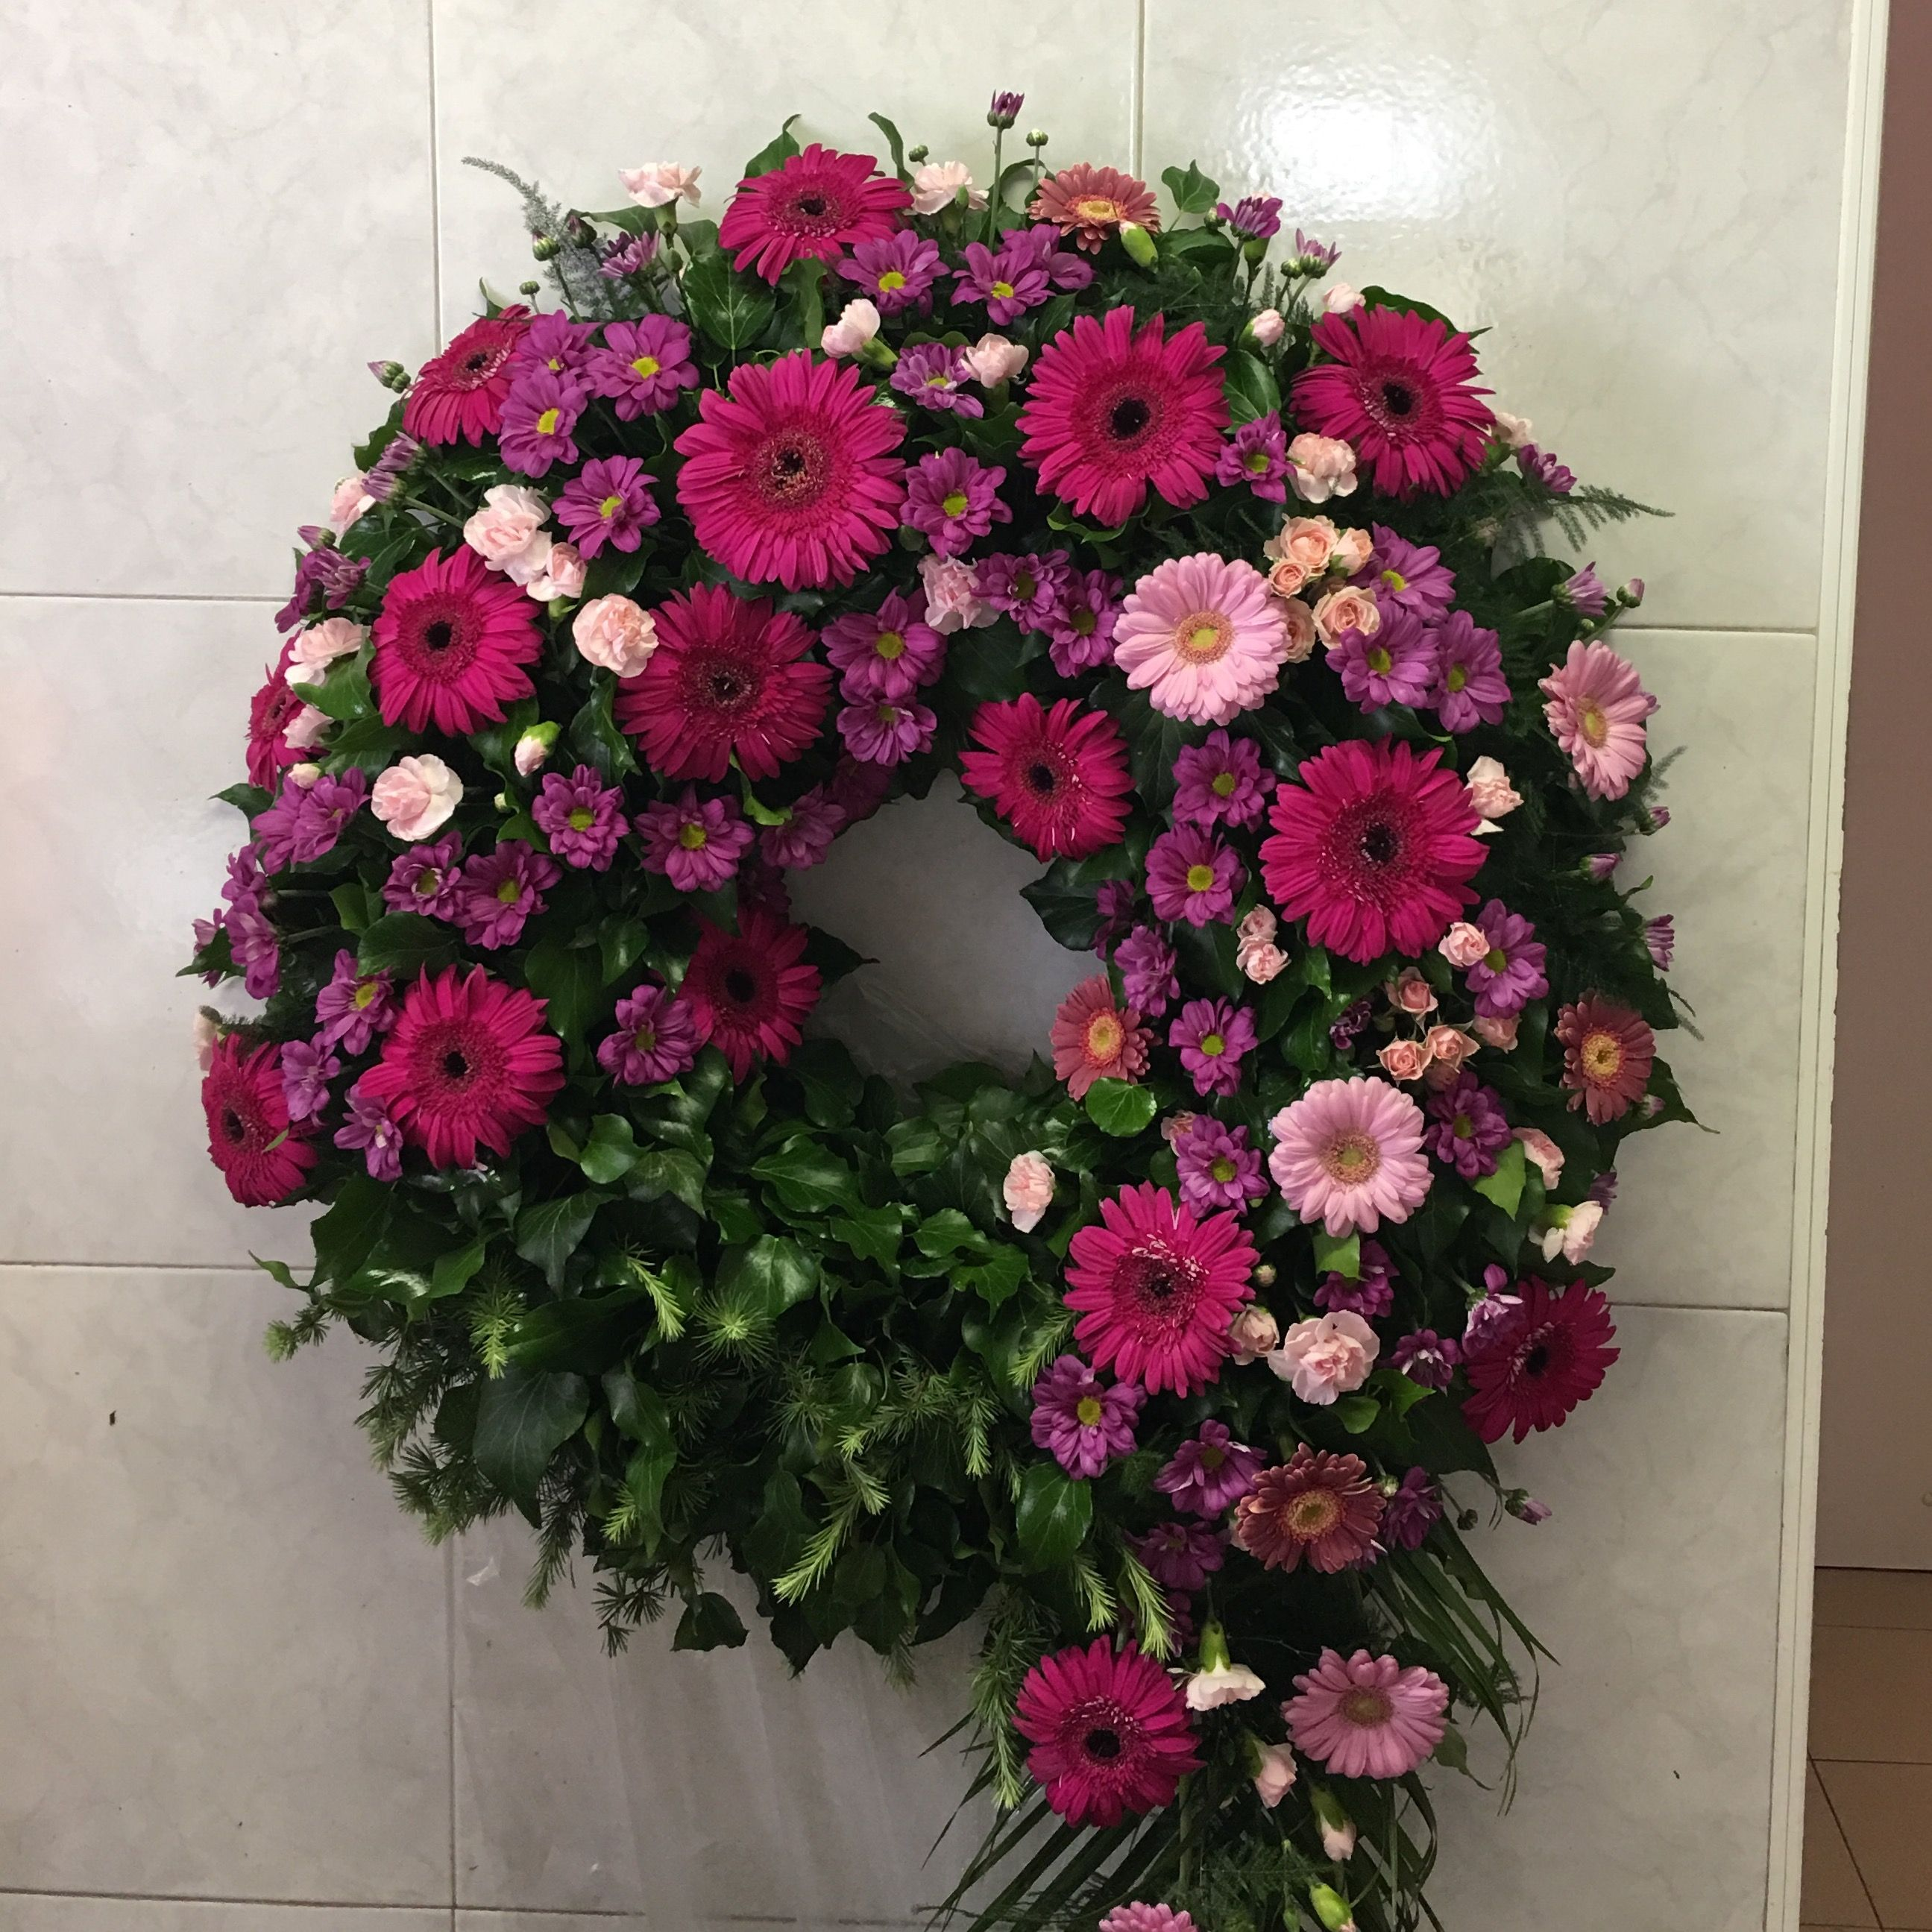 Wreath Funeral Flowers Pinterest Wreaths